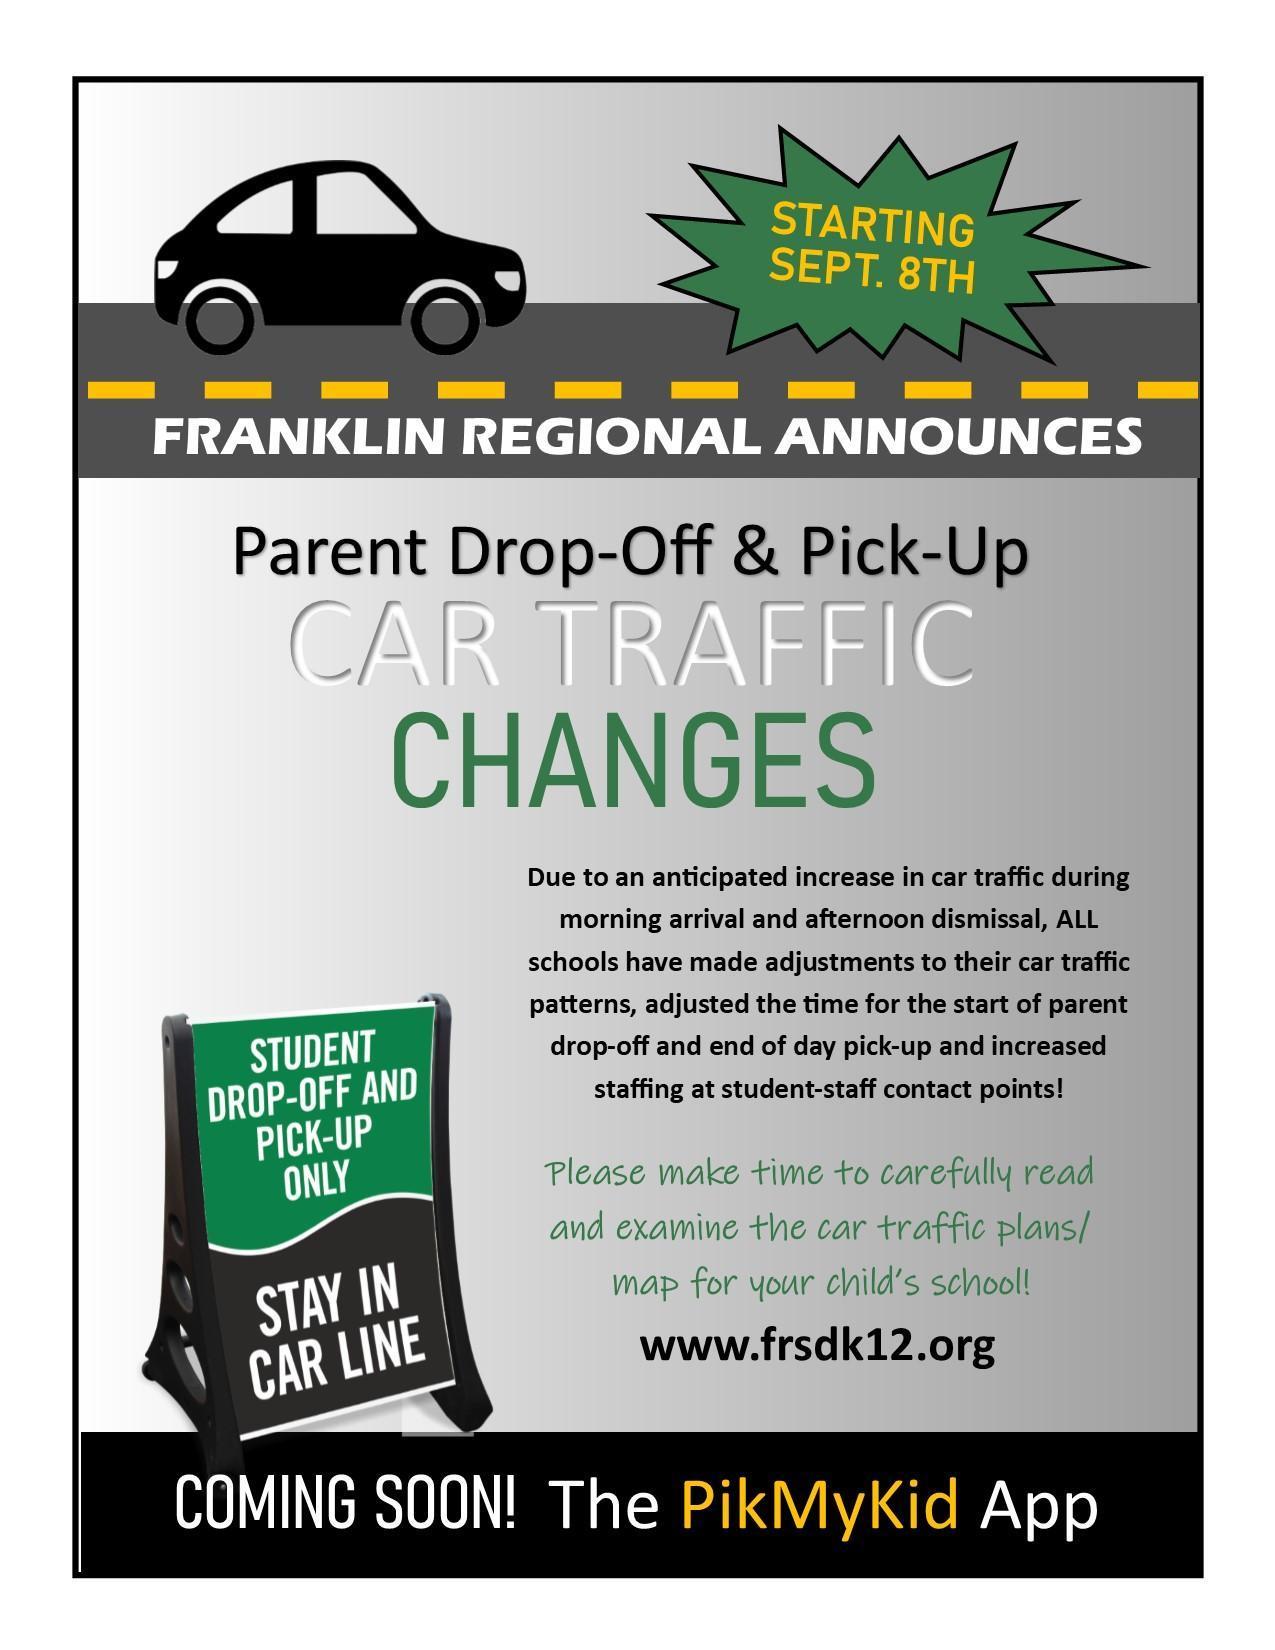 Car Traffic Changes